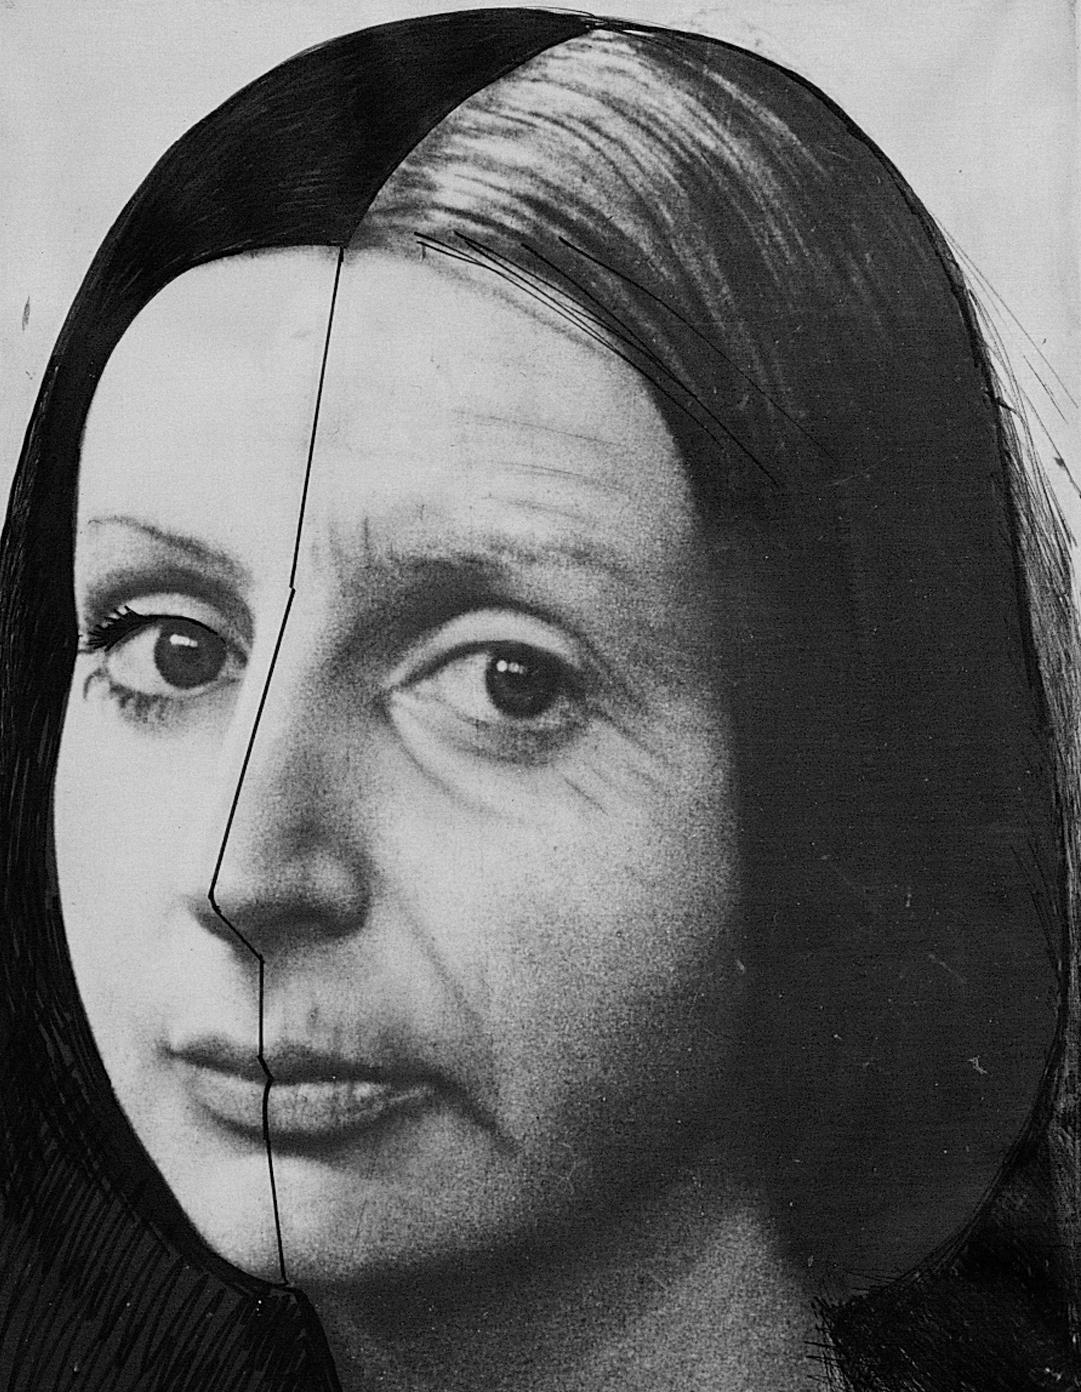 Ewa Partum, Change, my problem is a problem of a woman, 1978.